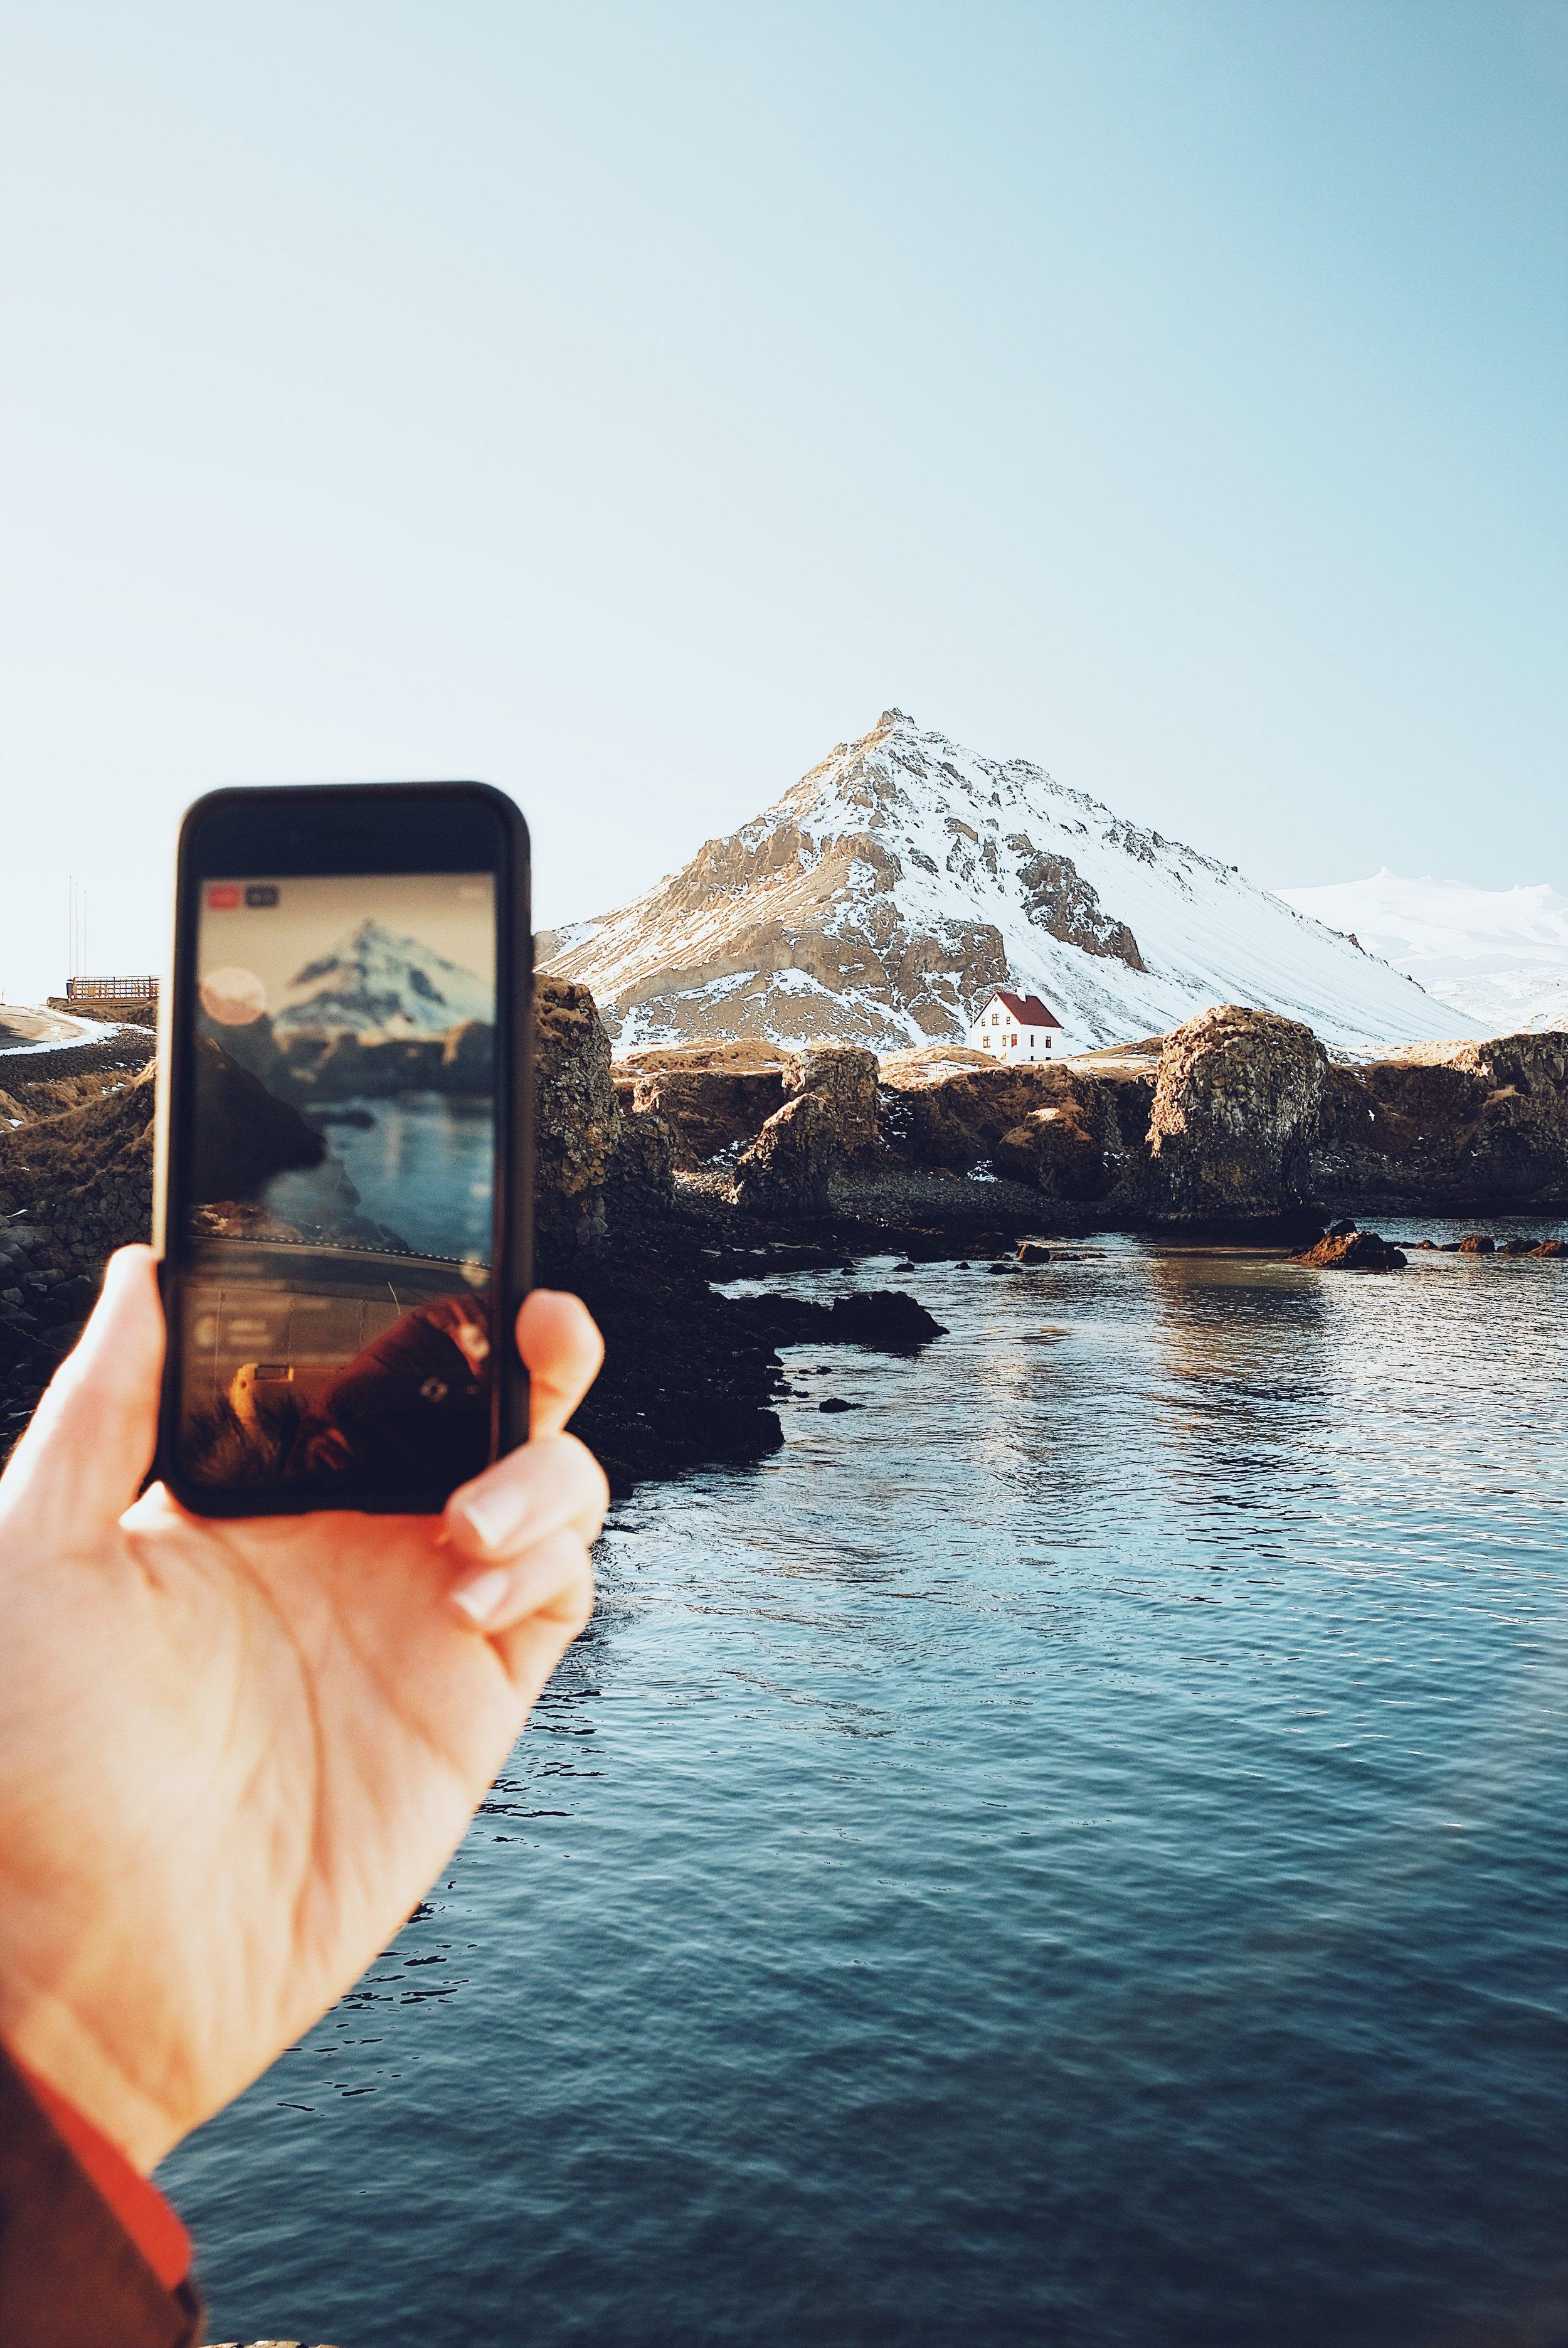 Instagram Live at Arnarstapi